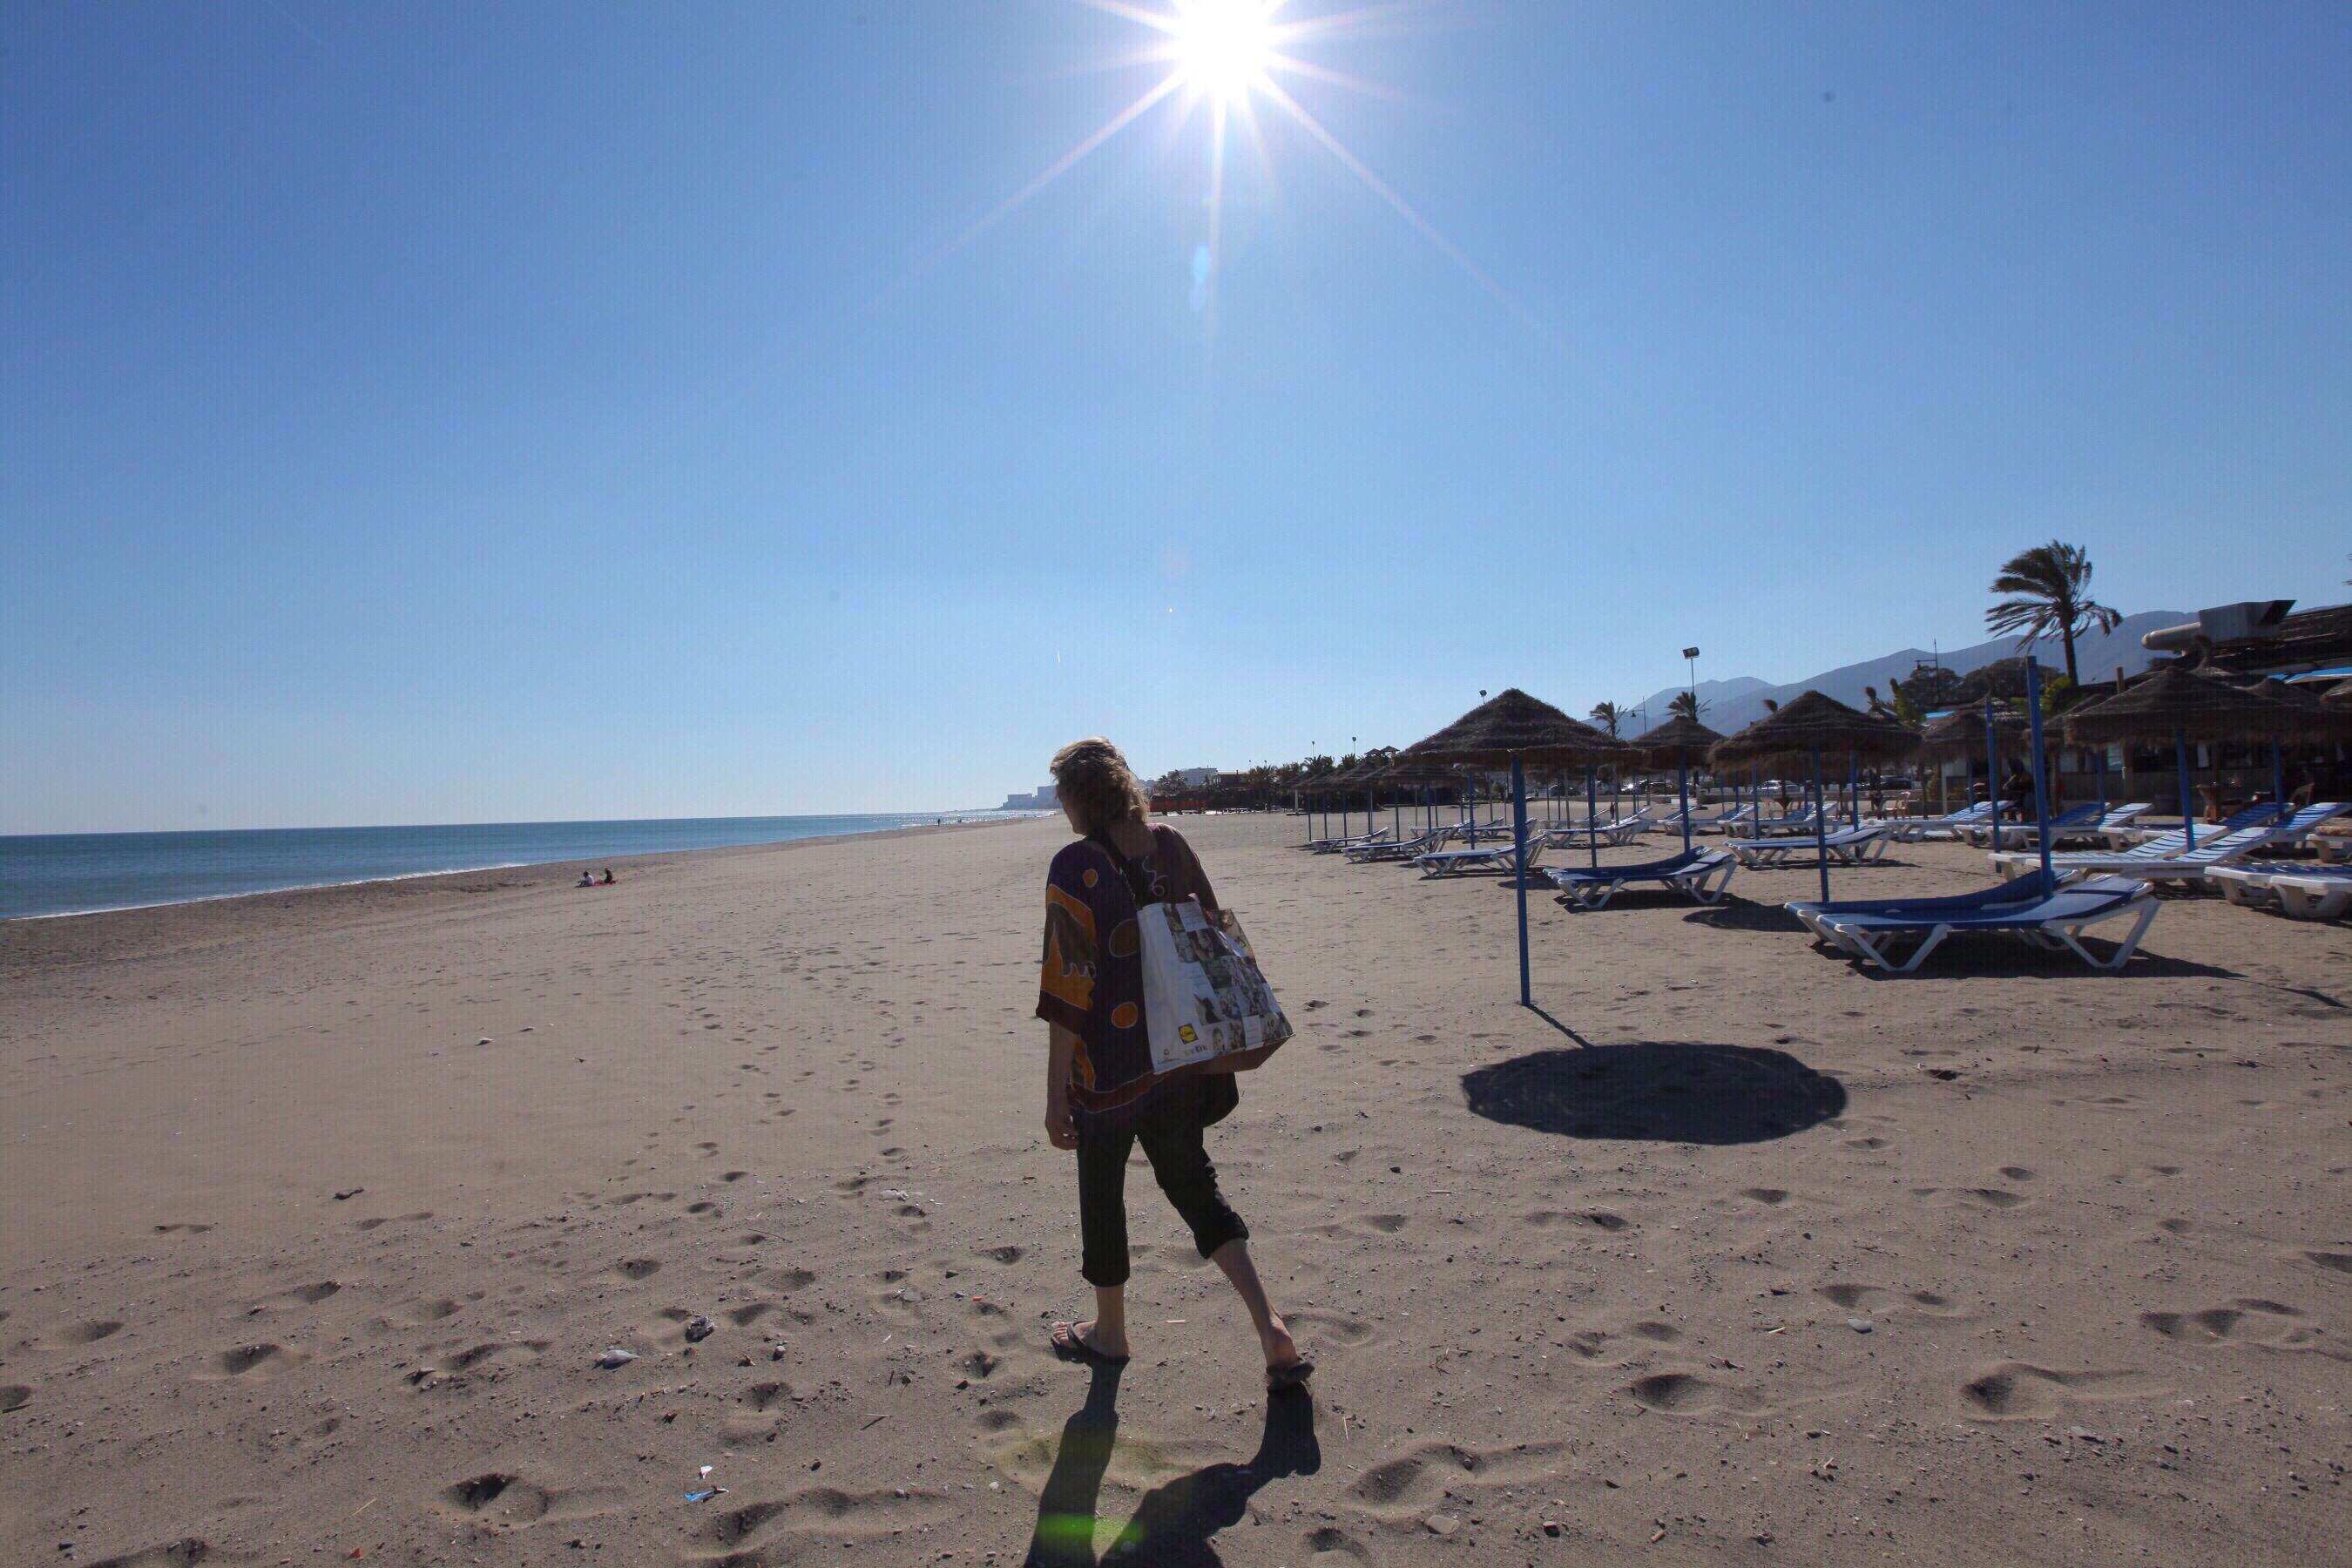 En tur til Malaga